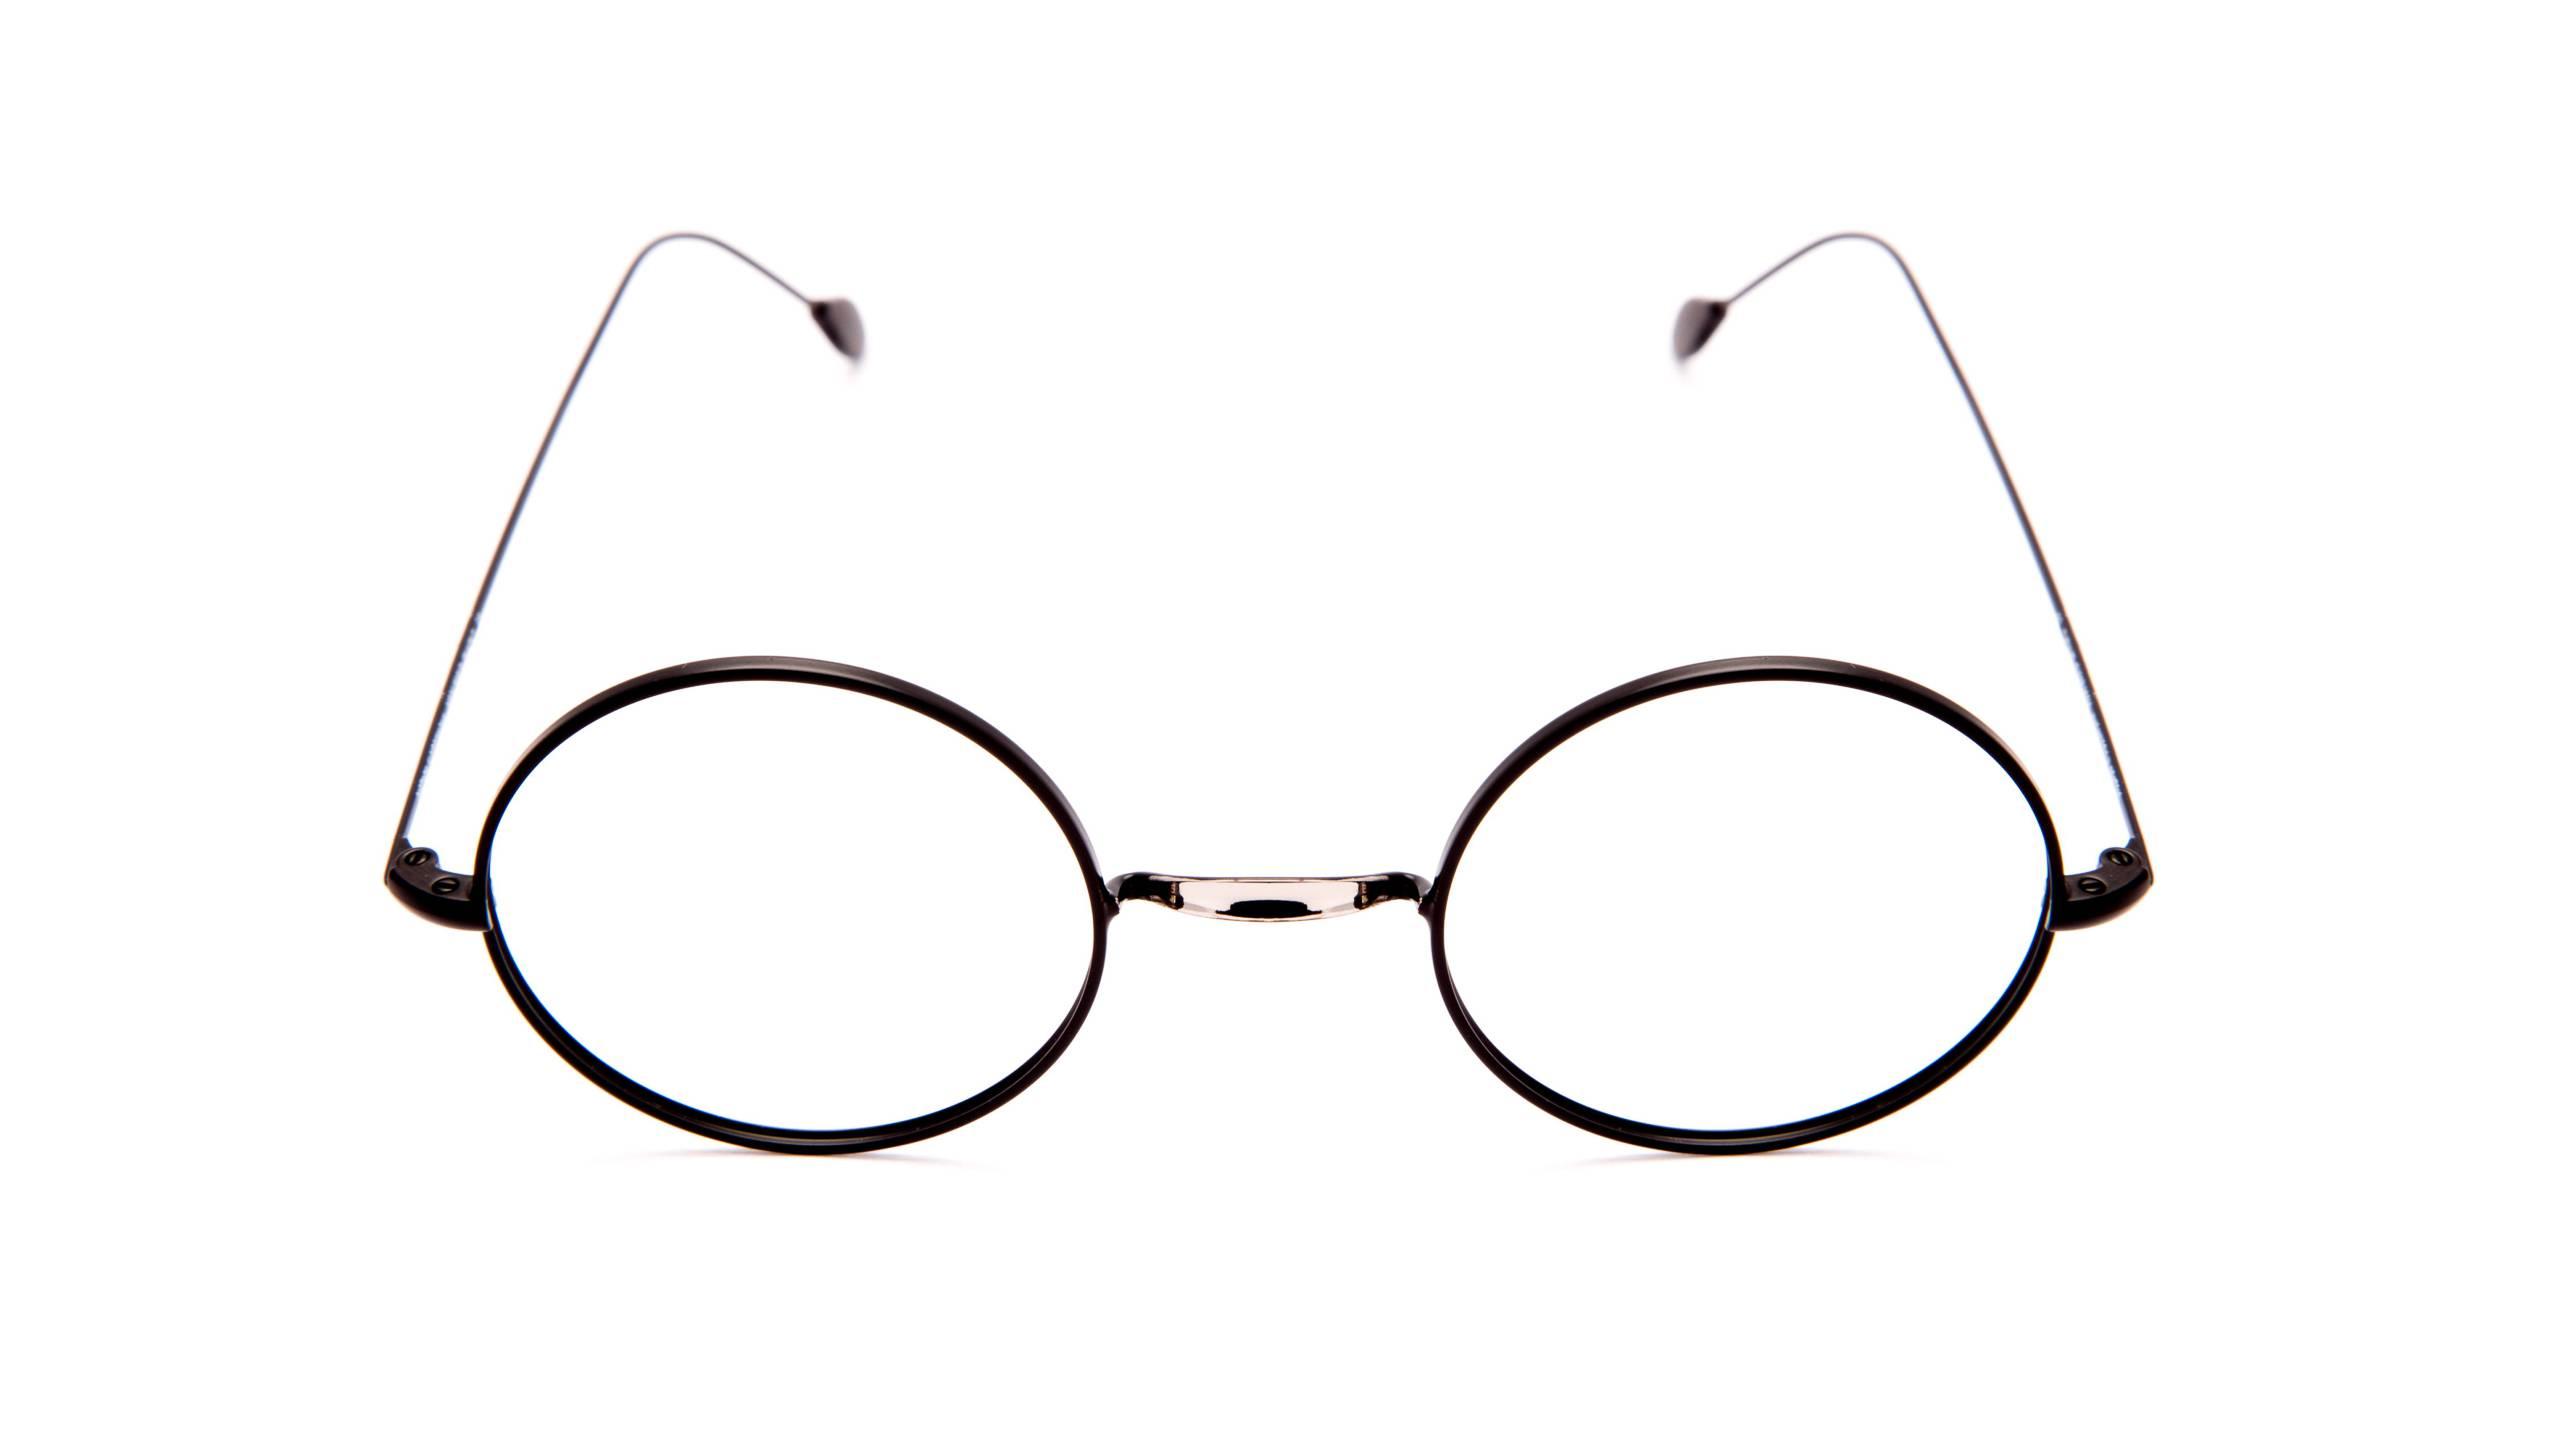 eyeglasses-Nathan-Kaltermann-made-in-Italy-ISCHIA-NERO-UNISEX-VISTA1